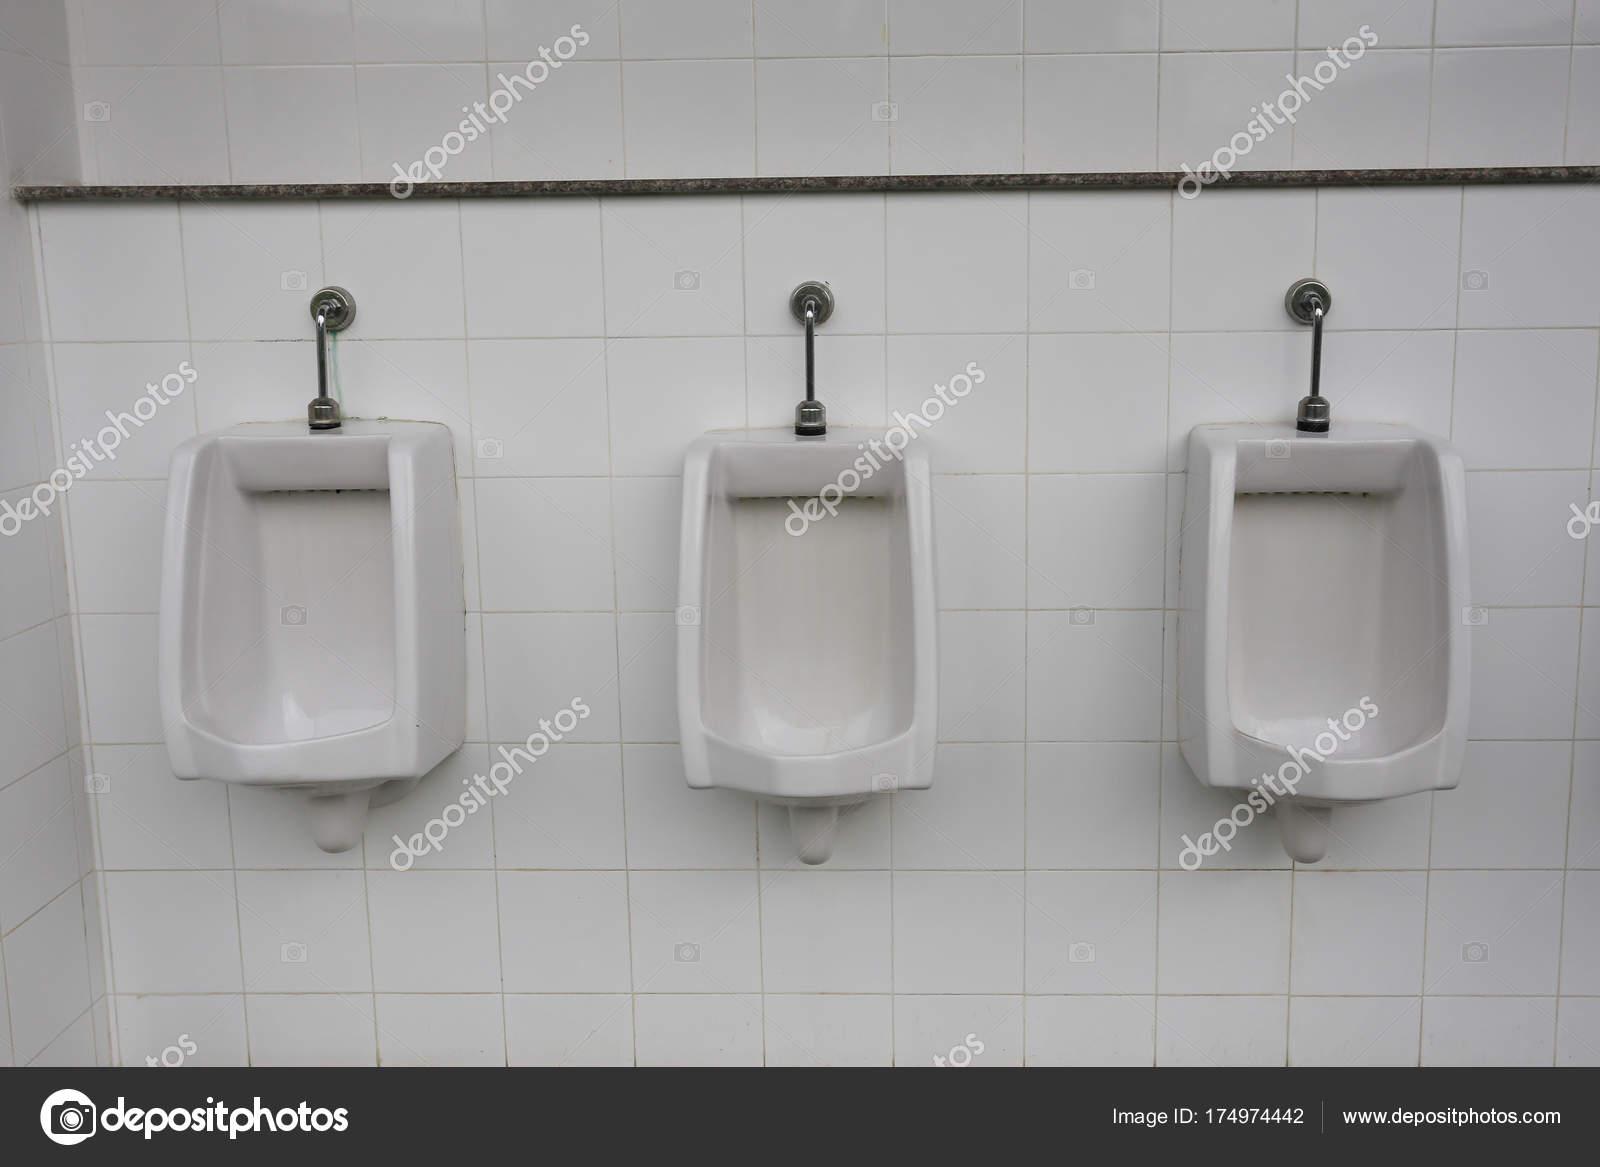 Urinoir In Badkamer : Moderne urinoir in mannen badkamer u2014 stockfoto © meepoohyaphoto